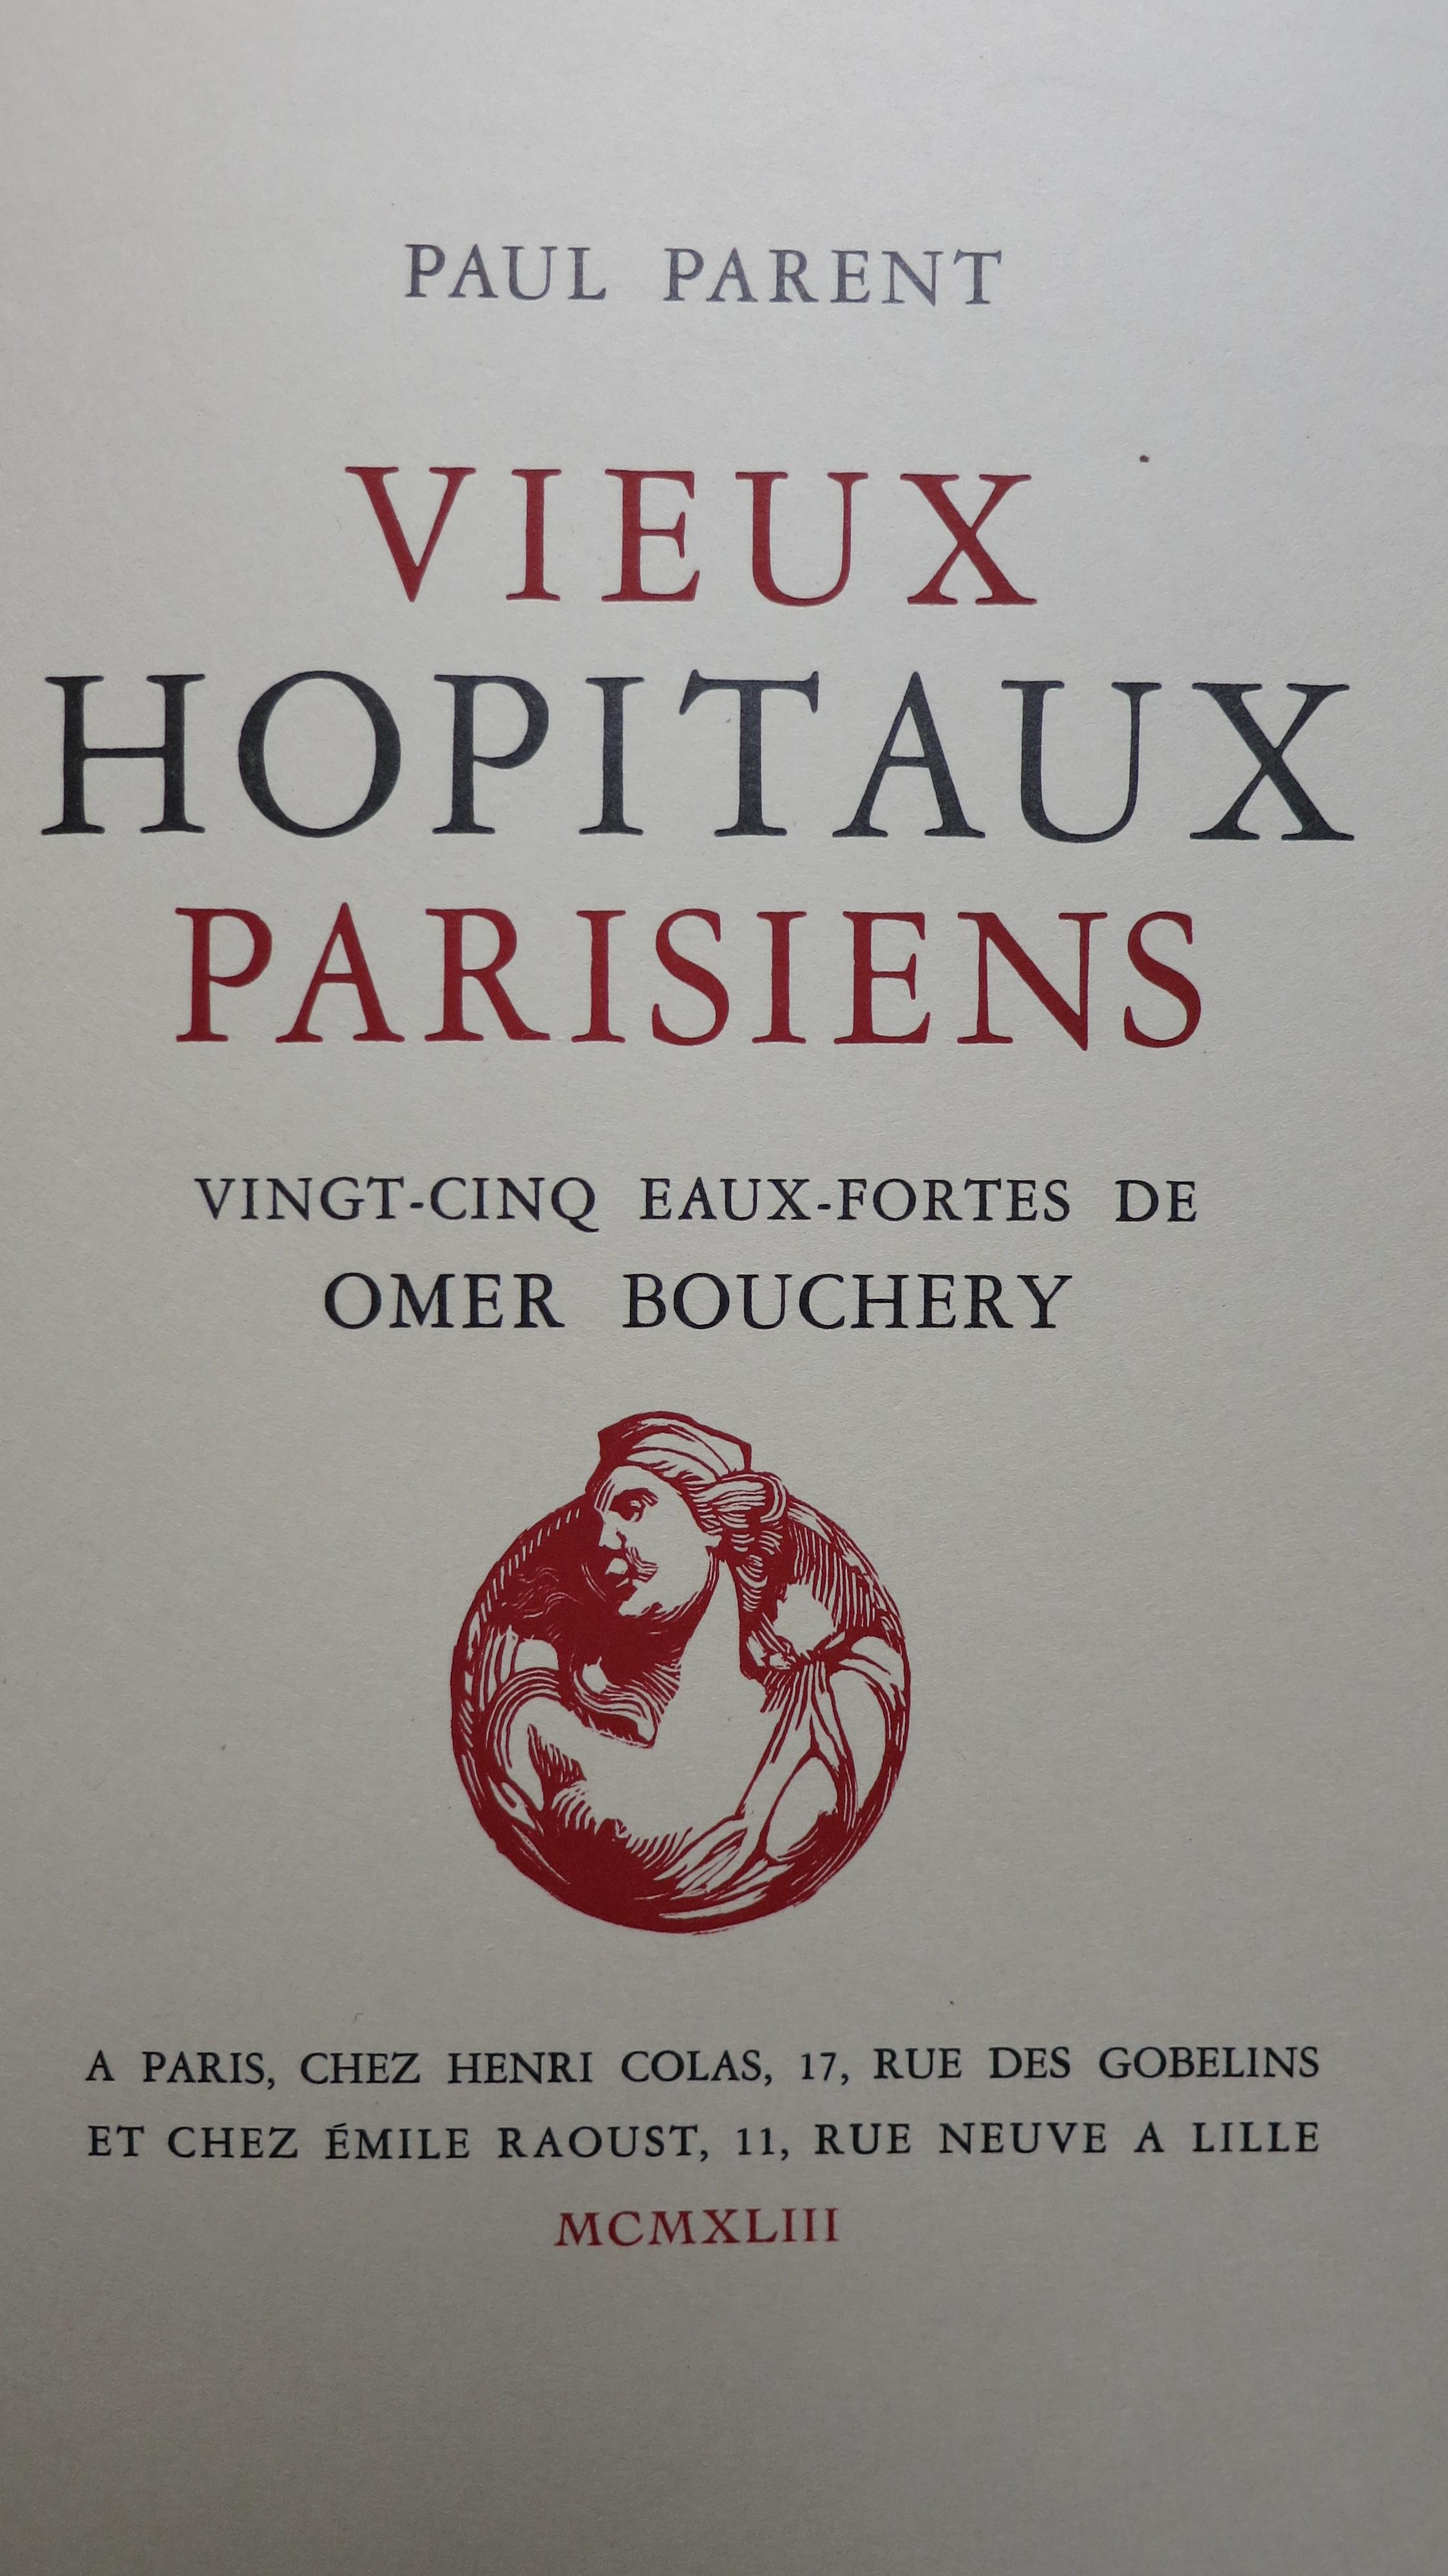 Vieux hôpitaux parisiens